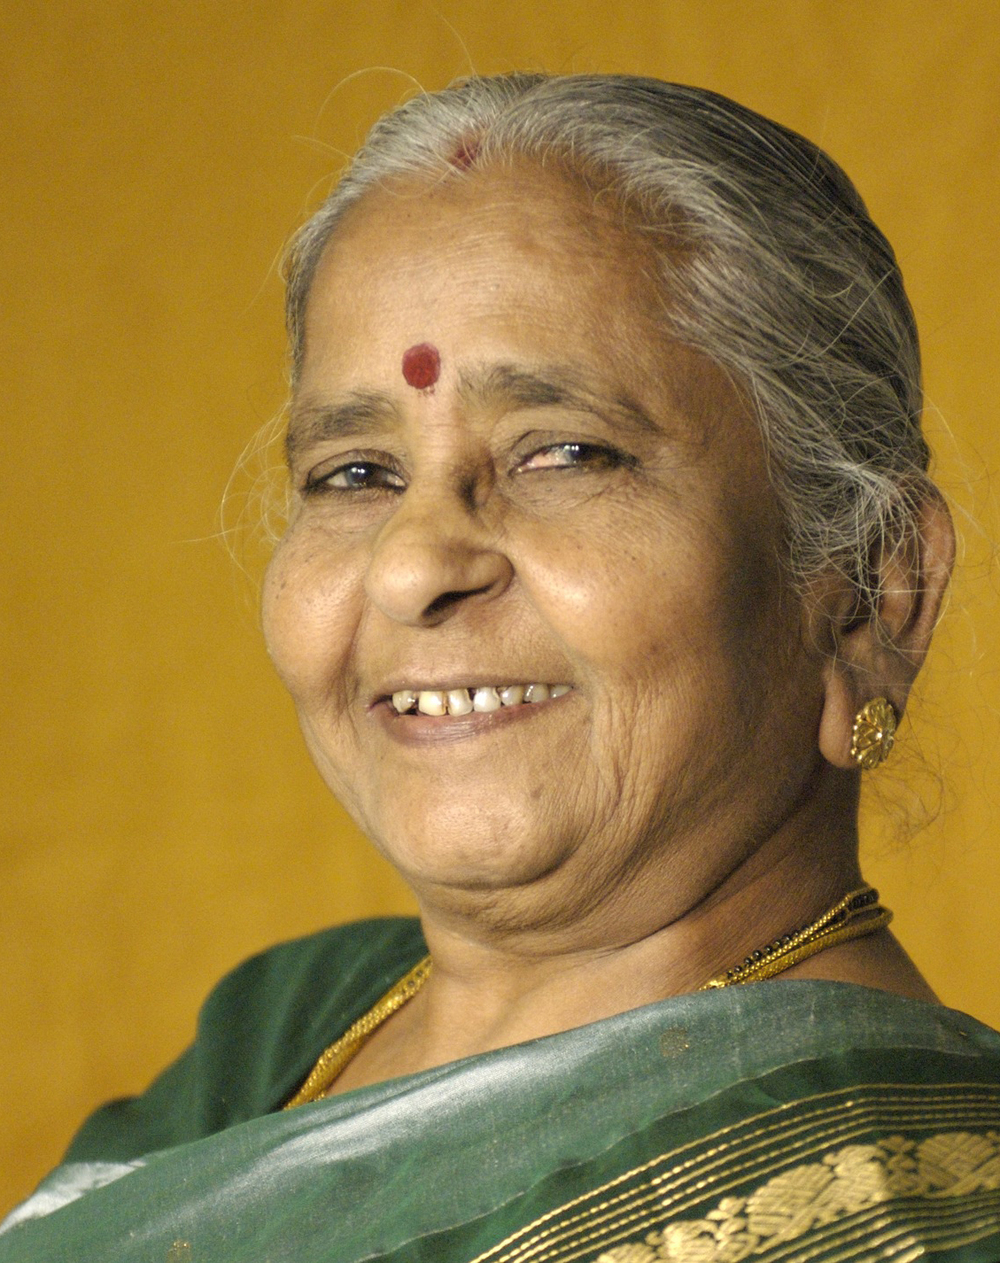 Indira Amperiani (Music & Lyrics Composer)